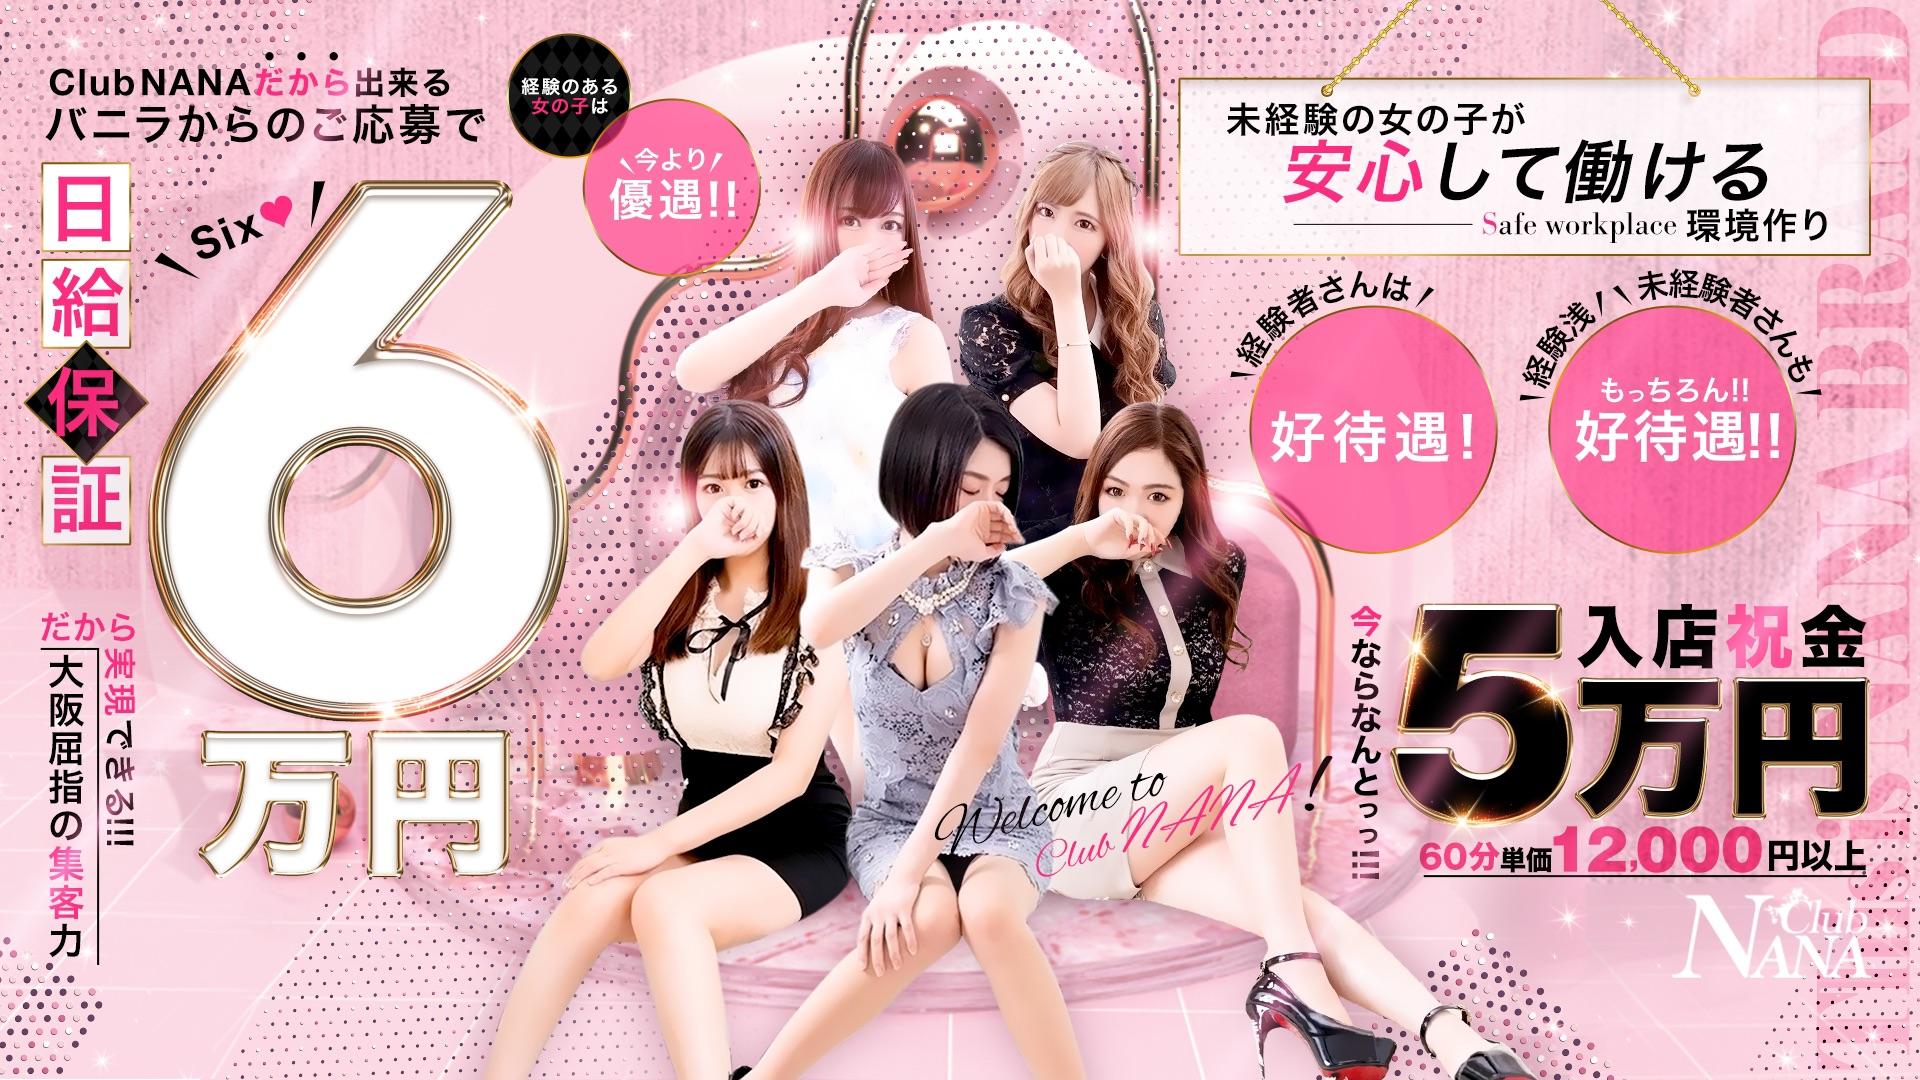 club NANA大阪の求人画像